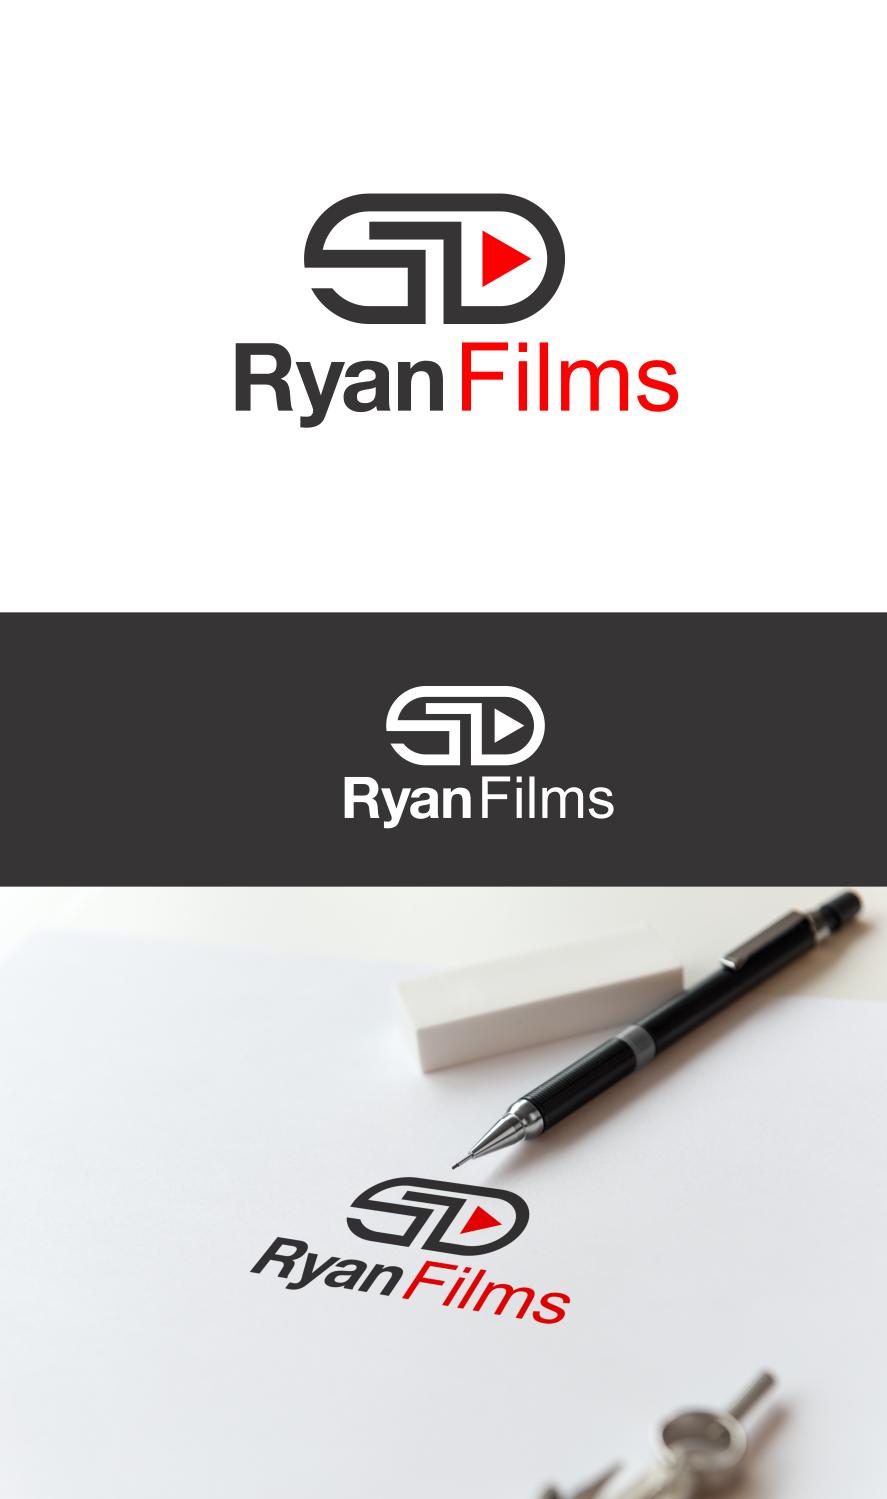 Professional Masculine Wedding Photography Logo Design For Ryan Films San Diego By Optimistic Studio Design 17144803